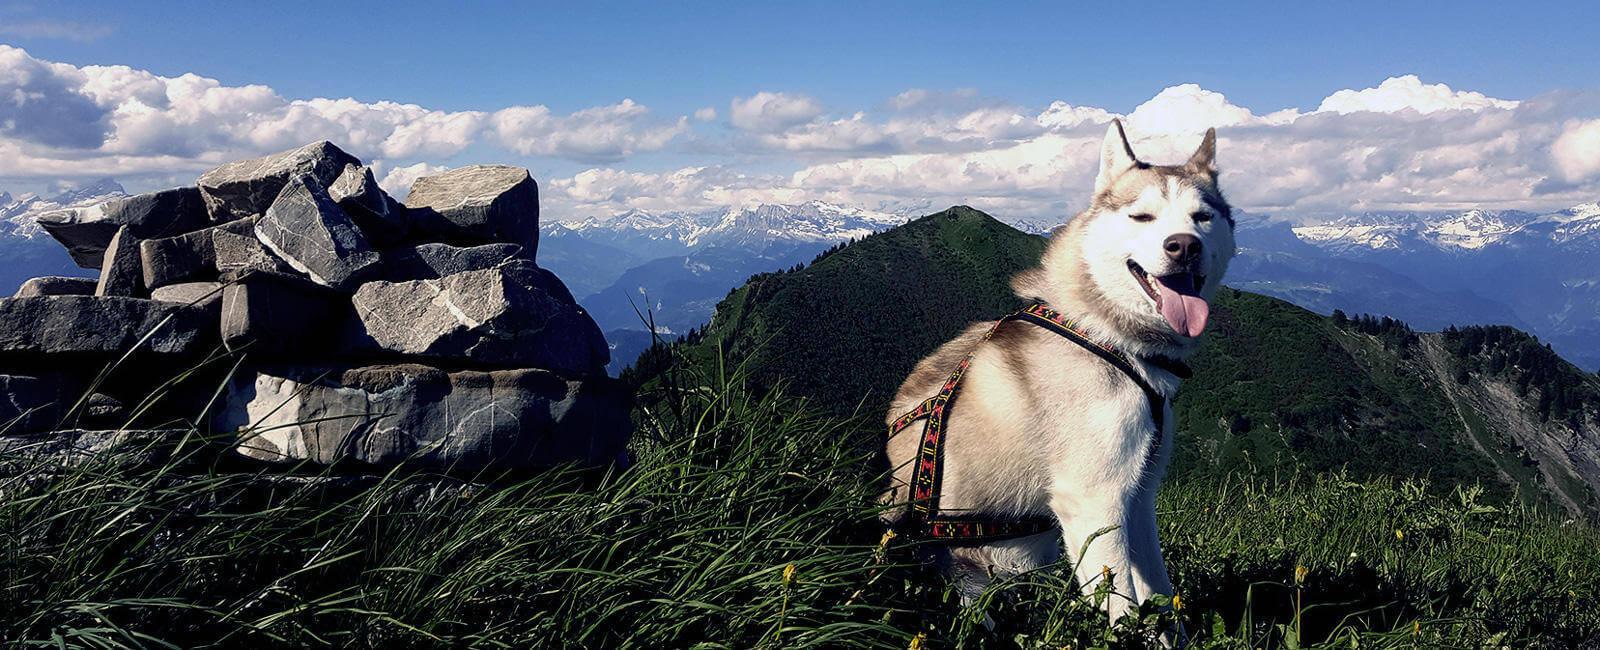 Say Goodbye to Dog-Walking and Say Hello to Dog-Led Hiking!